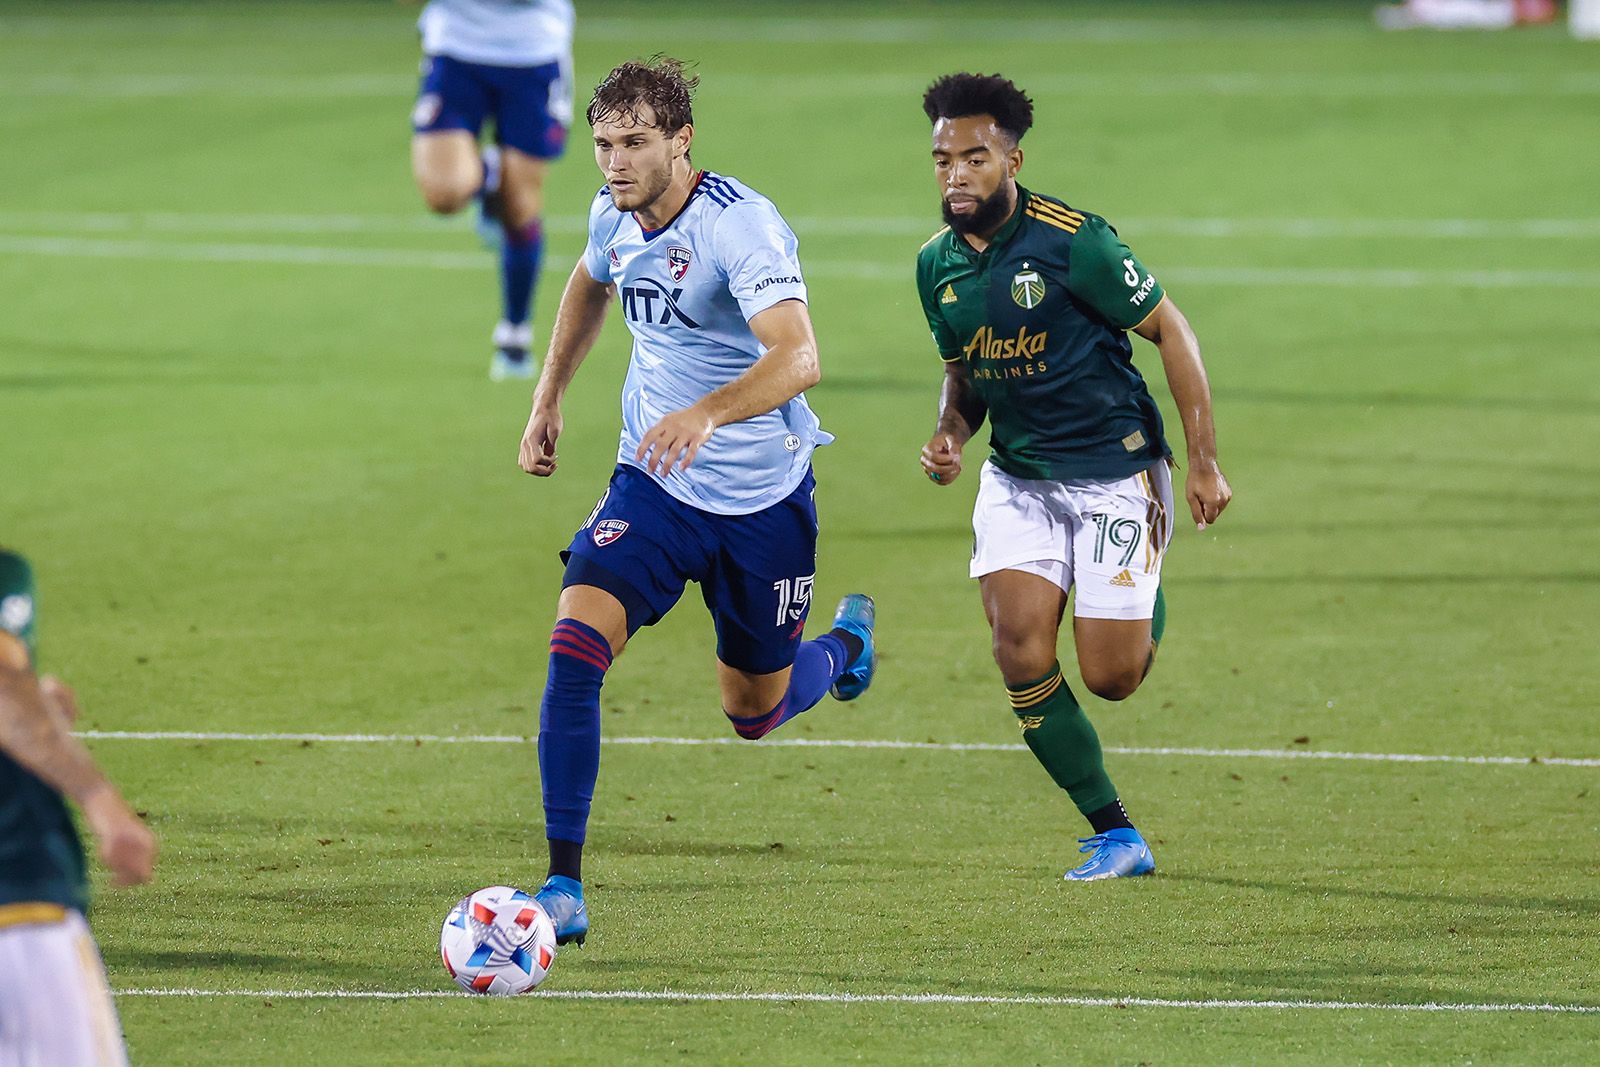 Tessmann FCD v Portland 5-1-21 640